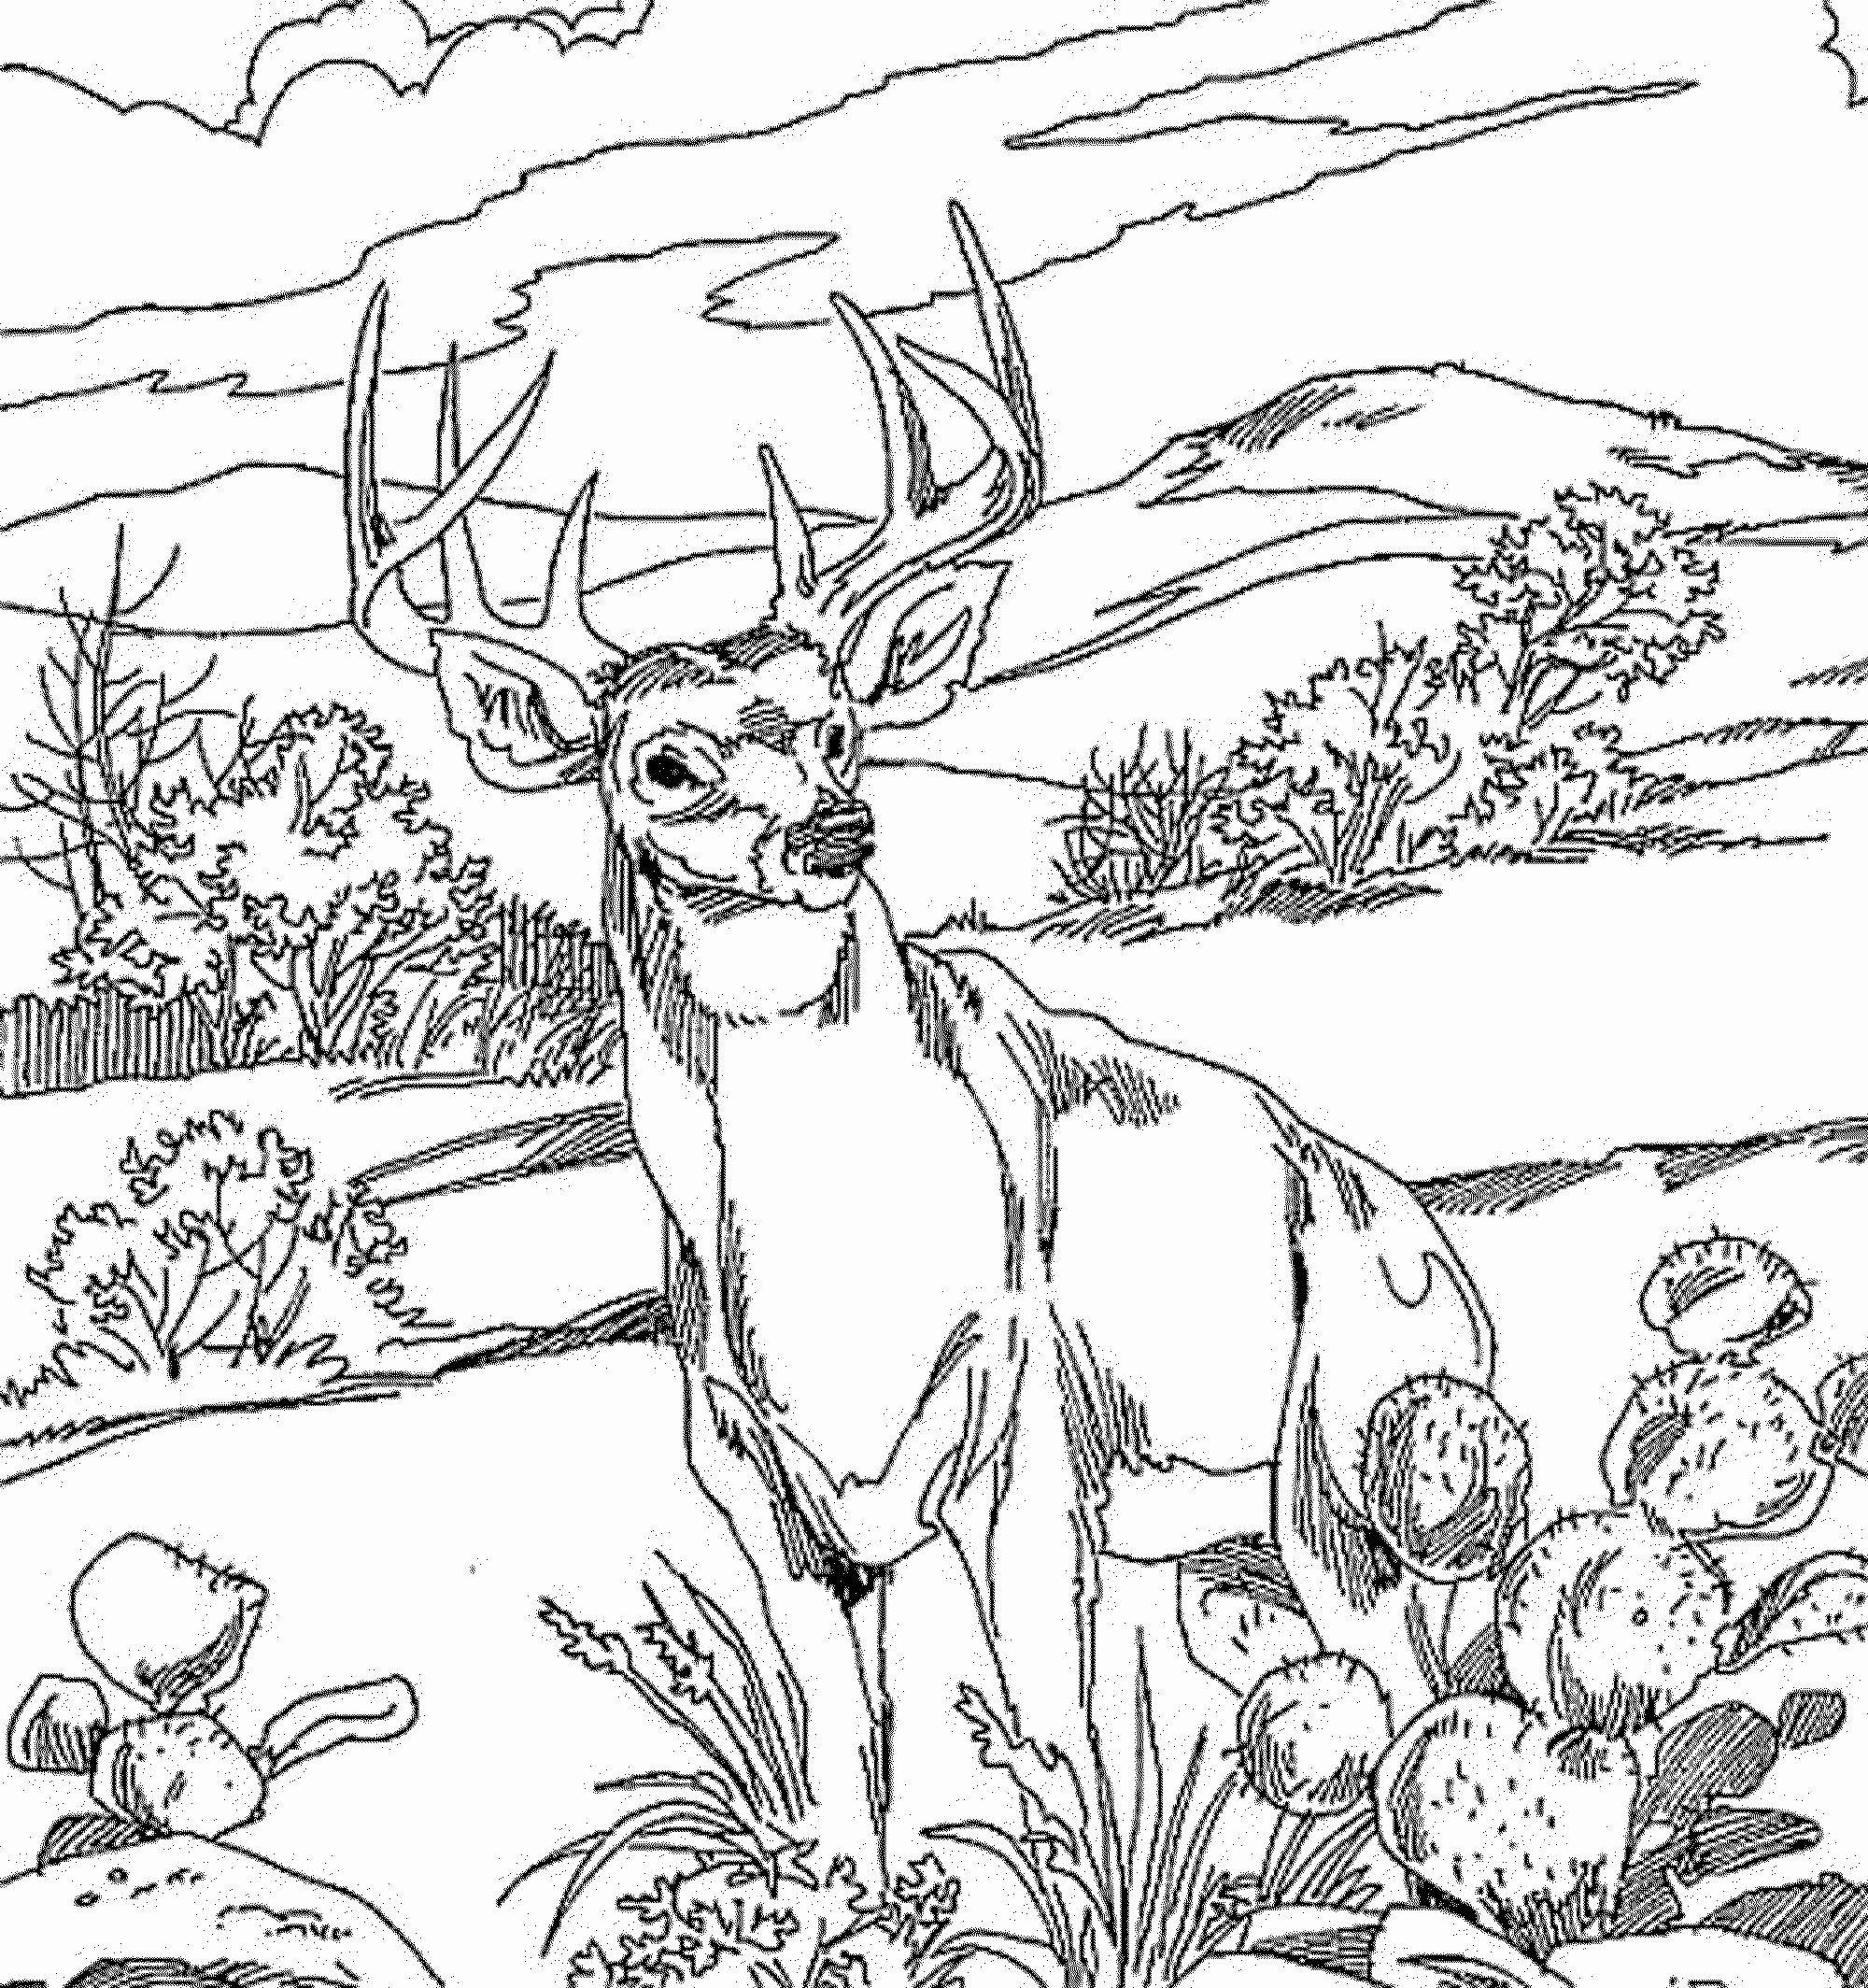 Complex Animal Coloring Pages Unique Coloring Pages Realistic Animal Coloring Pages Call In 2020 Deer Coloring Pages Animal Coloring Books Dog Coloring Page